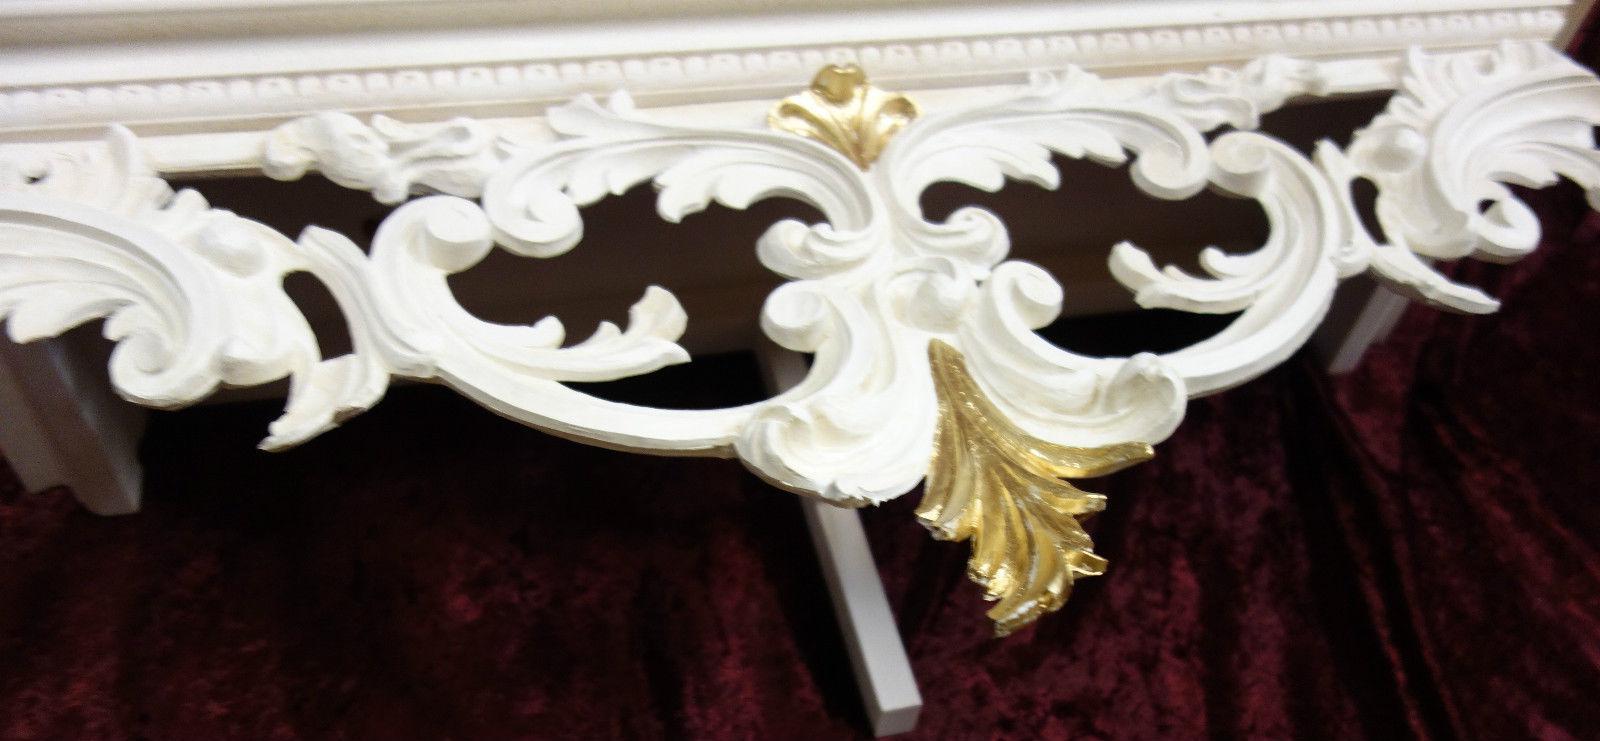 wandkonsole holz antik spiegelkonsolen wandregal barock. Black Bedroom Furniture Sets. Home Design Ideas